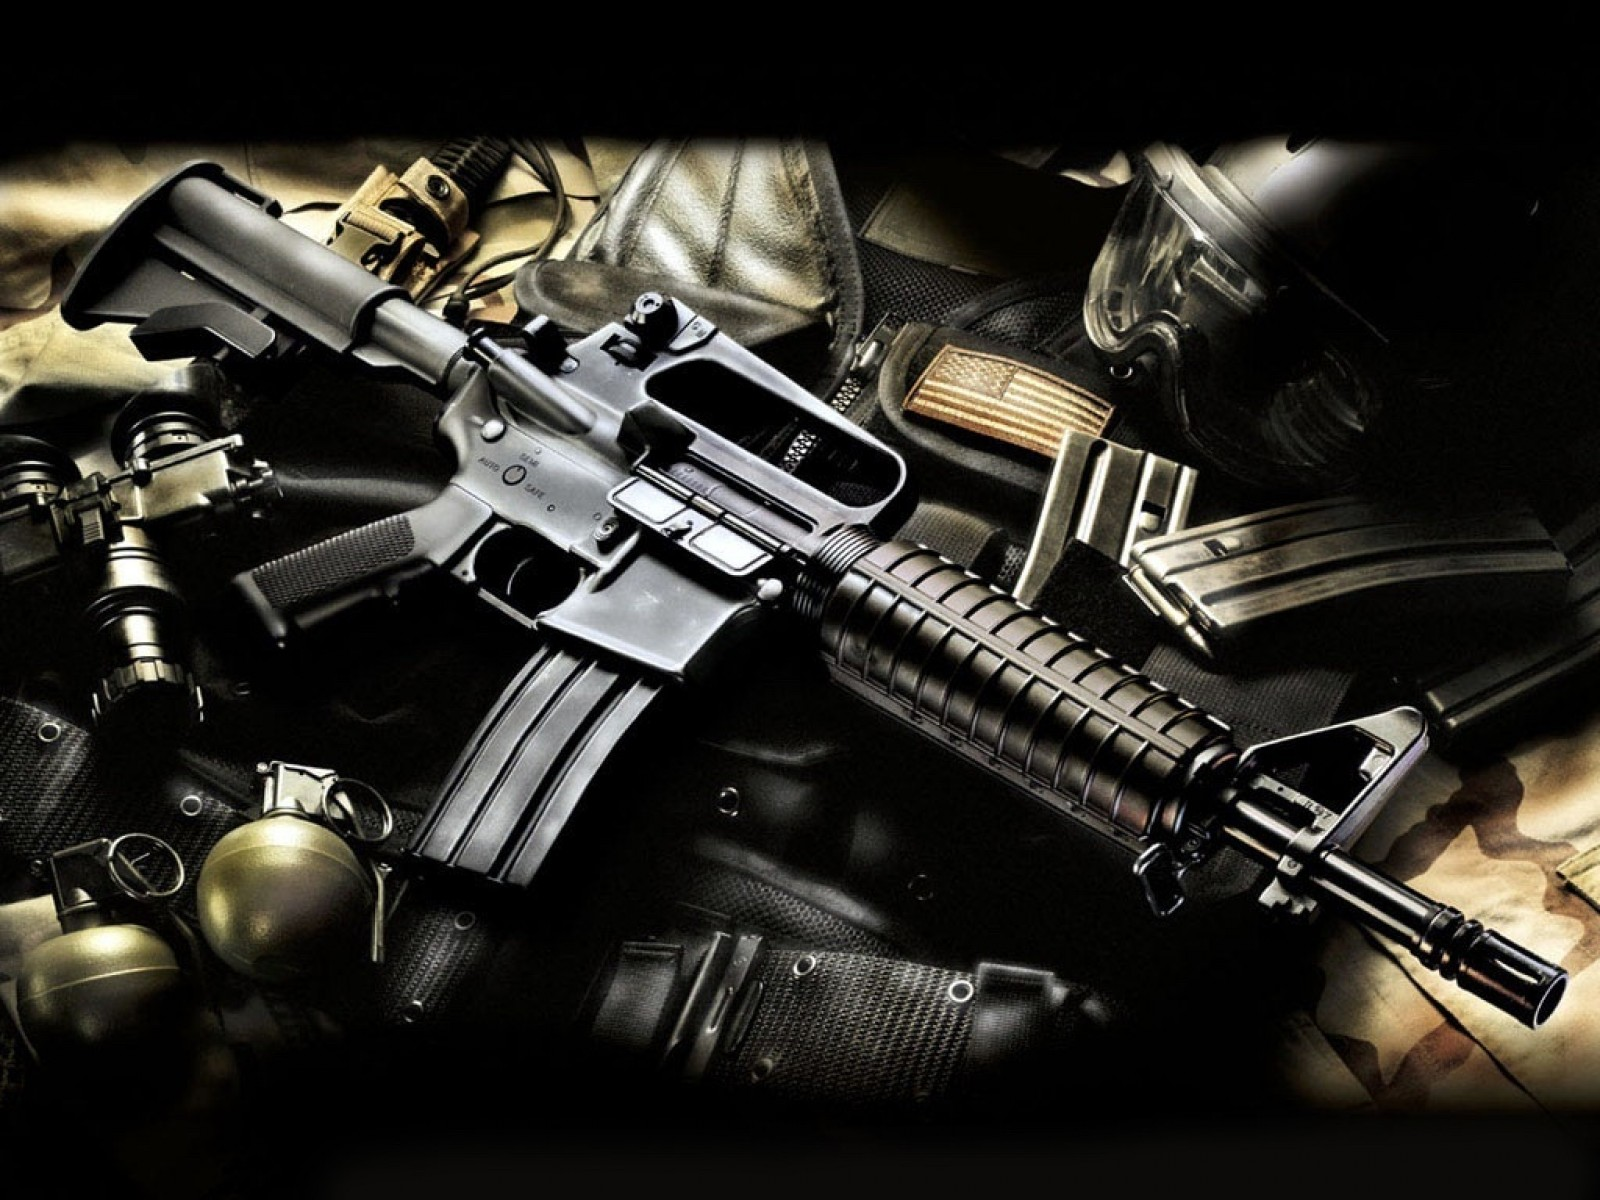 http://3.bp.blogspot.com/-xvWhk4ubC7c/TWl-k8JQ1nI/AAAAAAAABKc/MkllBV5x14o/s1600/Latest-Weapon-images-nite-sniper-pistol-acial-troops-1600x1200.jpg